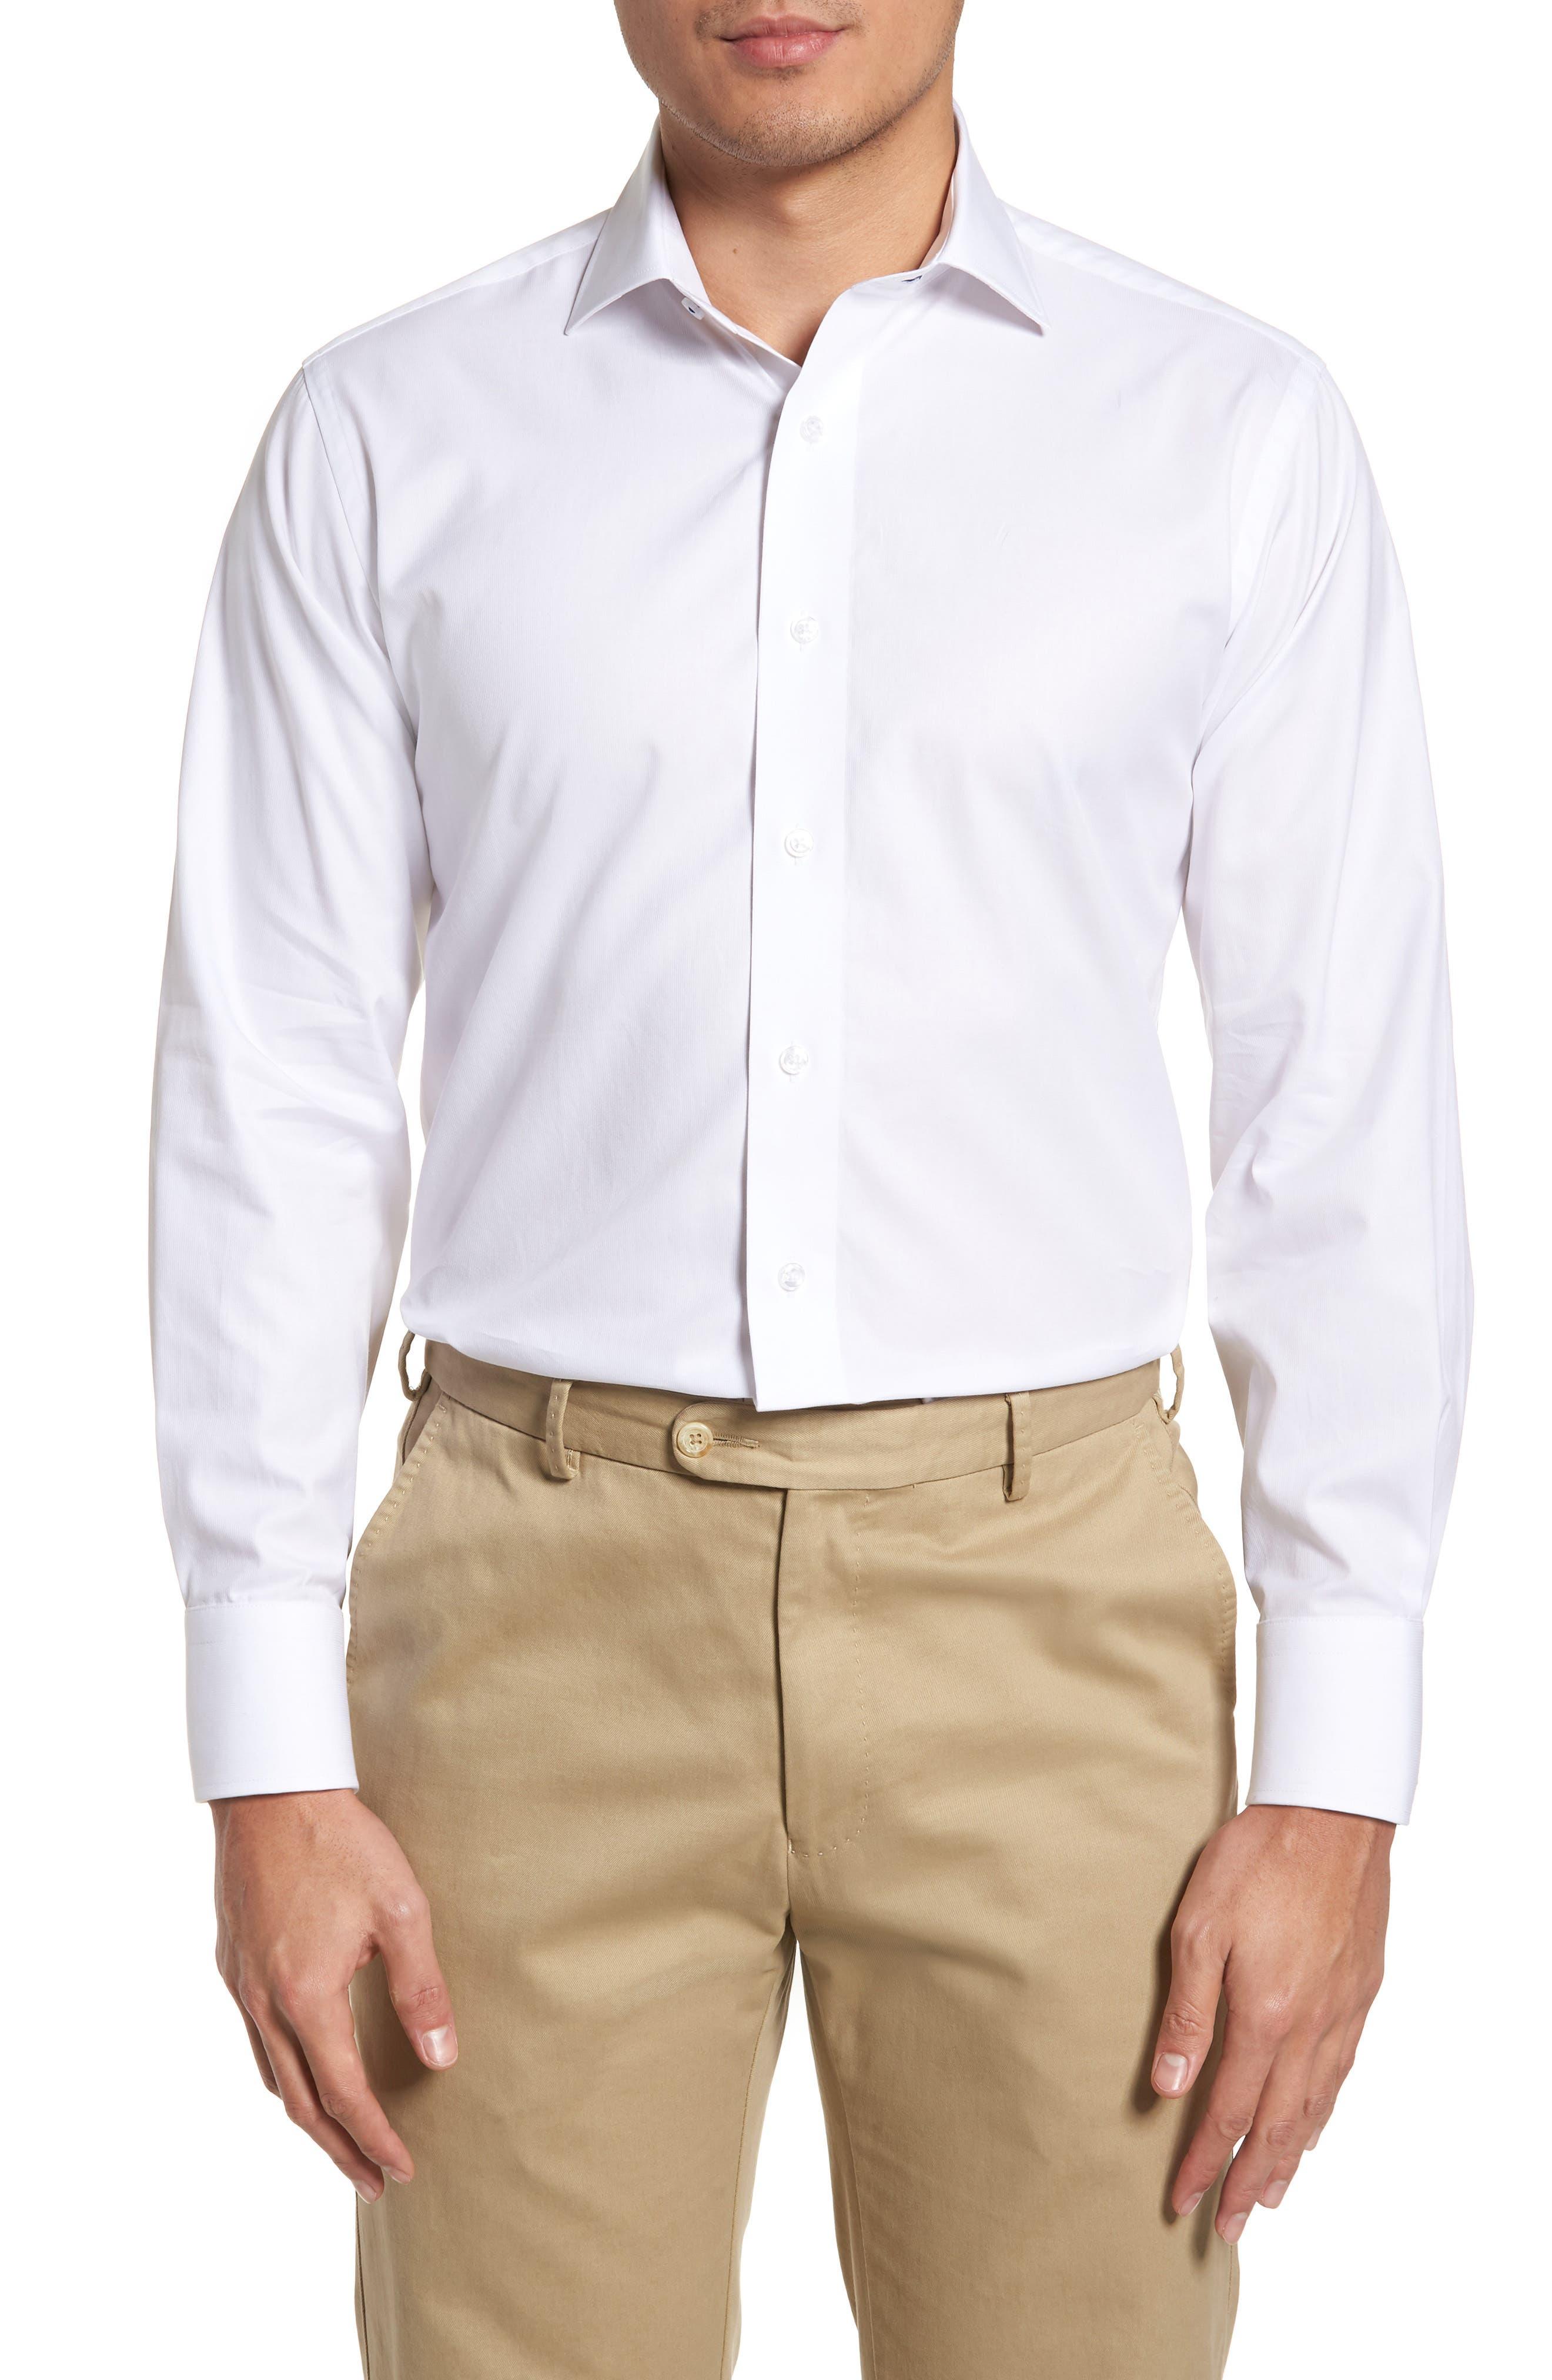 LORENZO UOMO, Trim Fit Solid Dress Shirt, Main thumbnail 1, color, WHITE